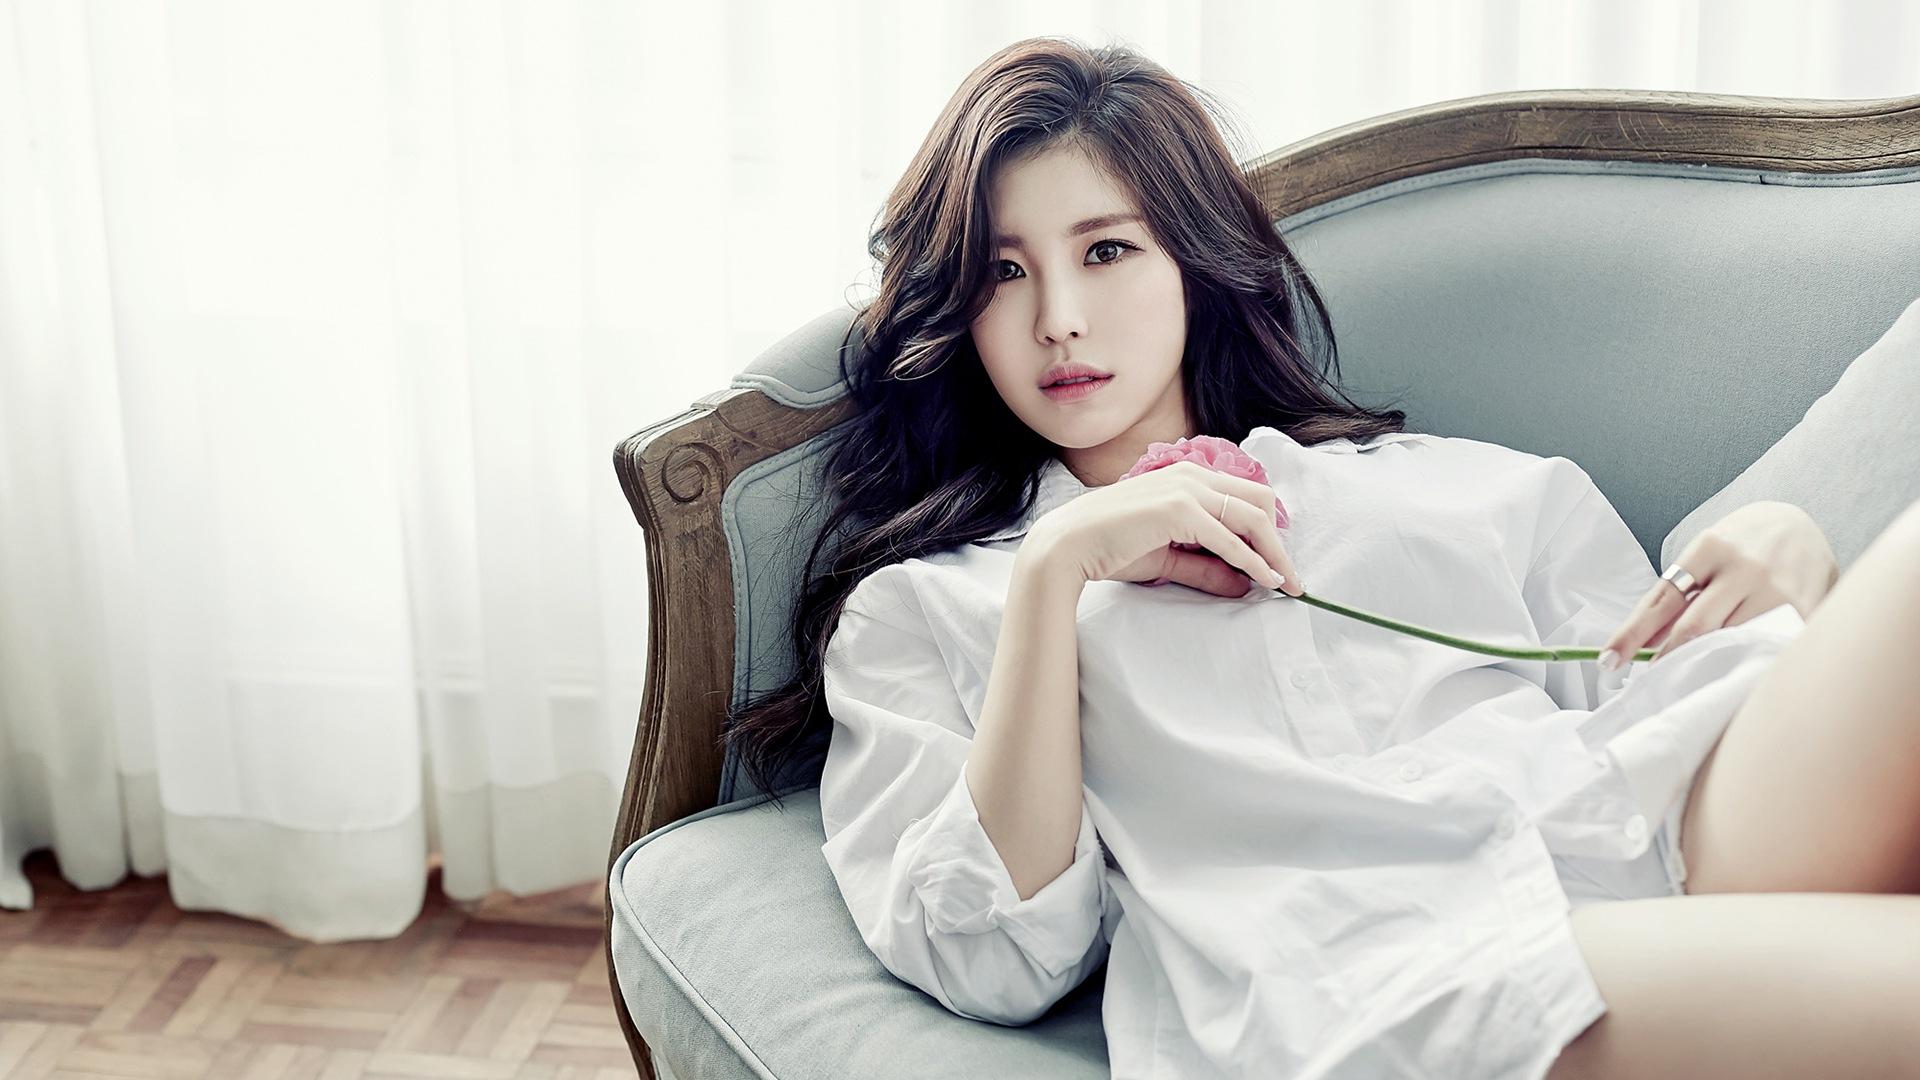 Korean Girl Wallpaper - Pretty South Korean Girl , HD Wallpaper & Backgrounds